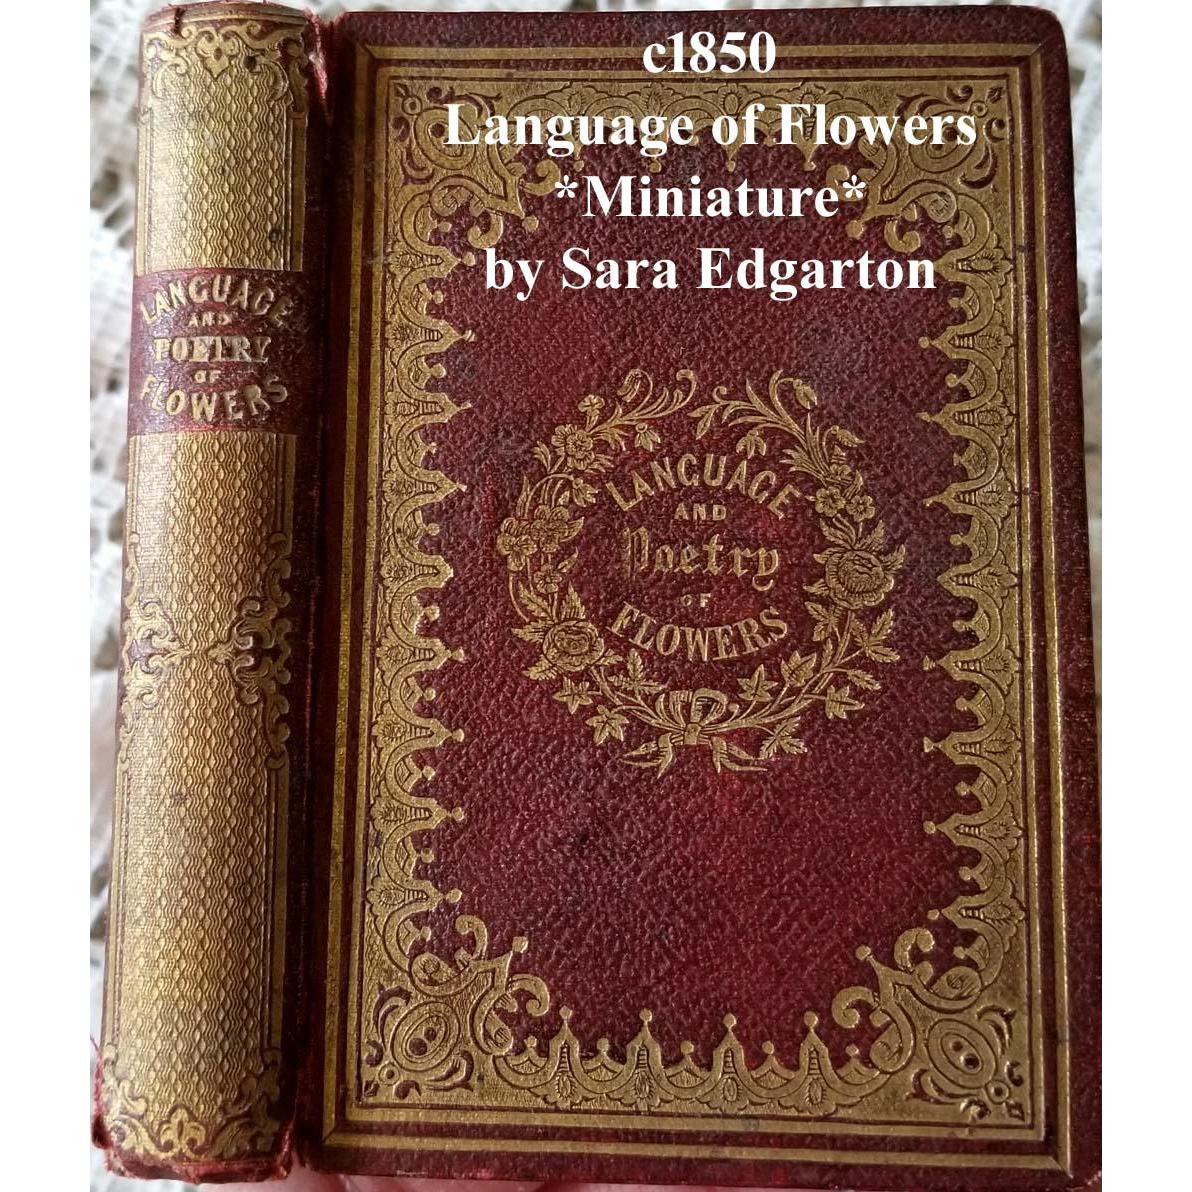 c1850 Language and Poetry of Flowers Book Miniature Edgarton Pre Civil War Sentiment Symbolism